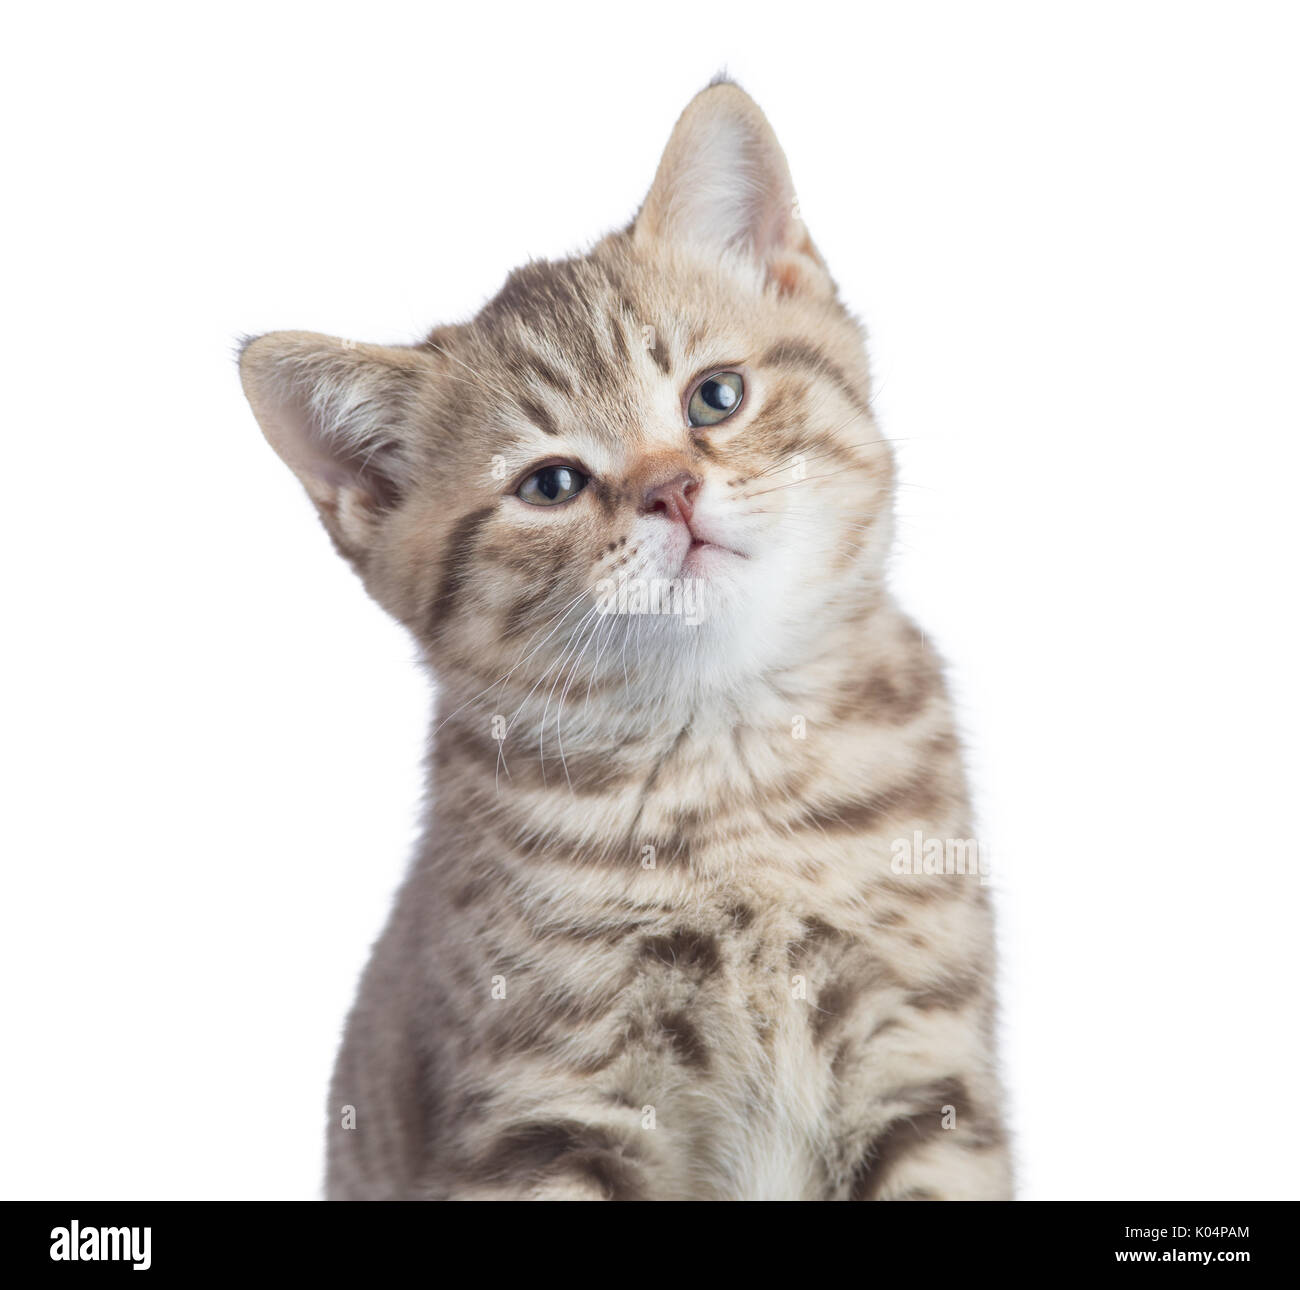 Lustige Katze Video